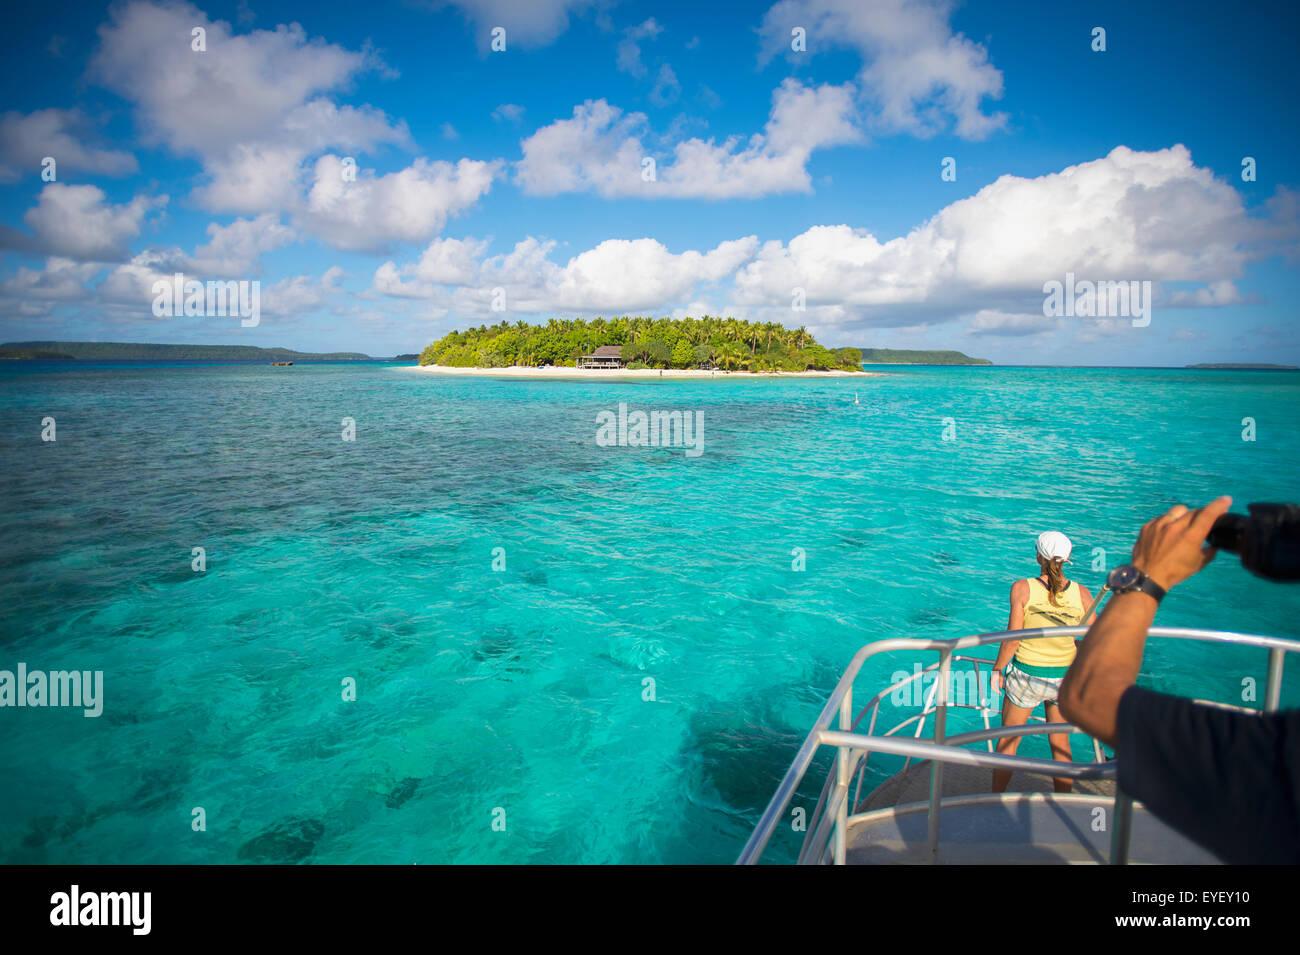 Tourists view Mounu Island from a boat; Vavau, Tonga Stock Photo